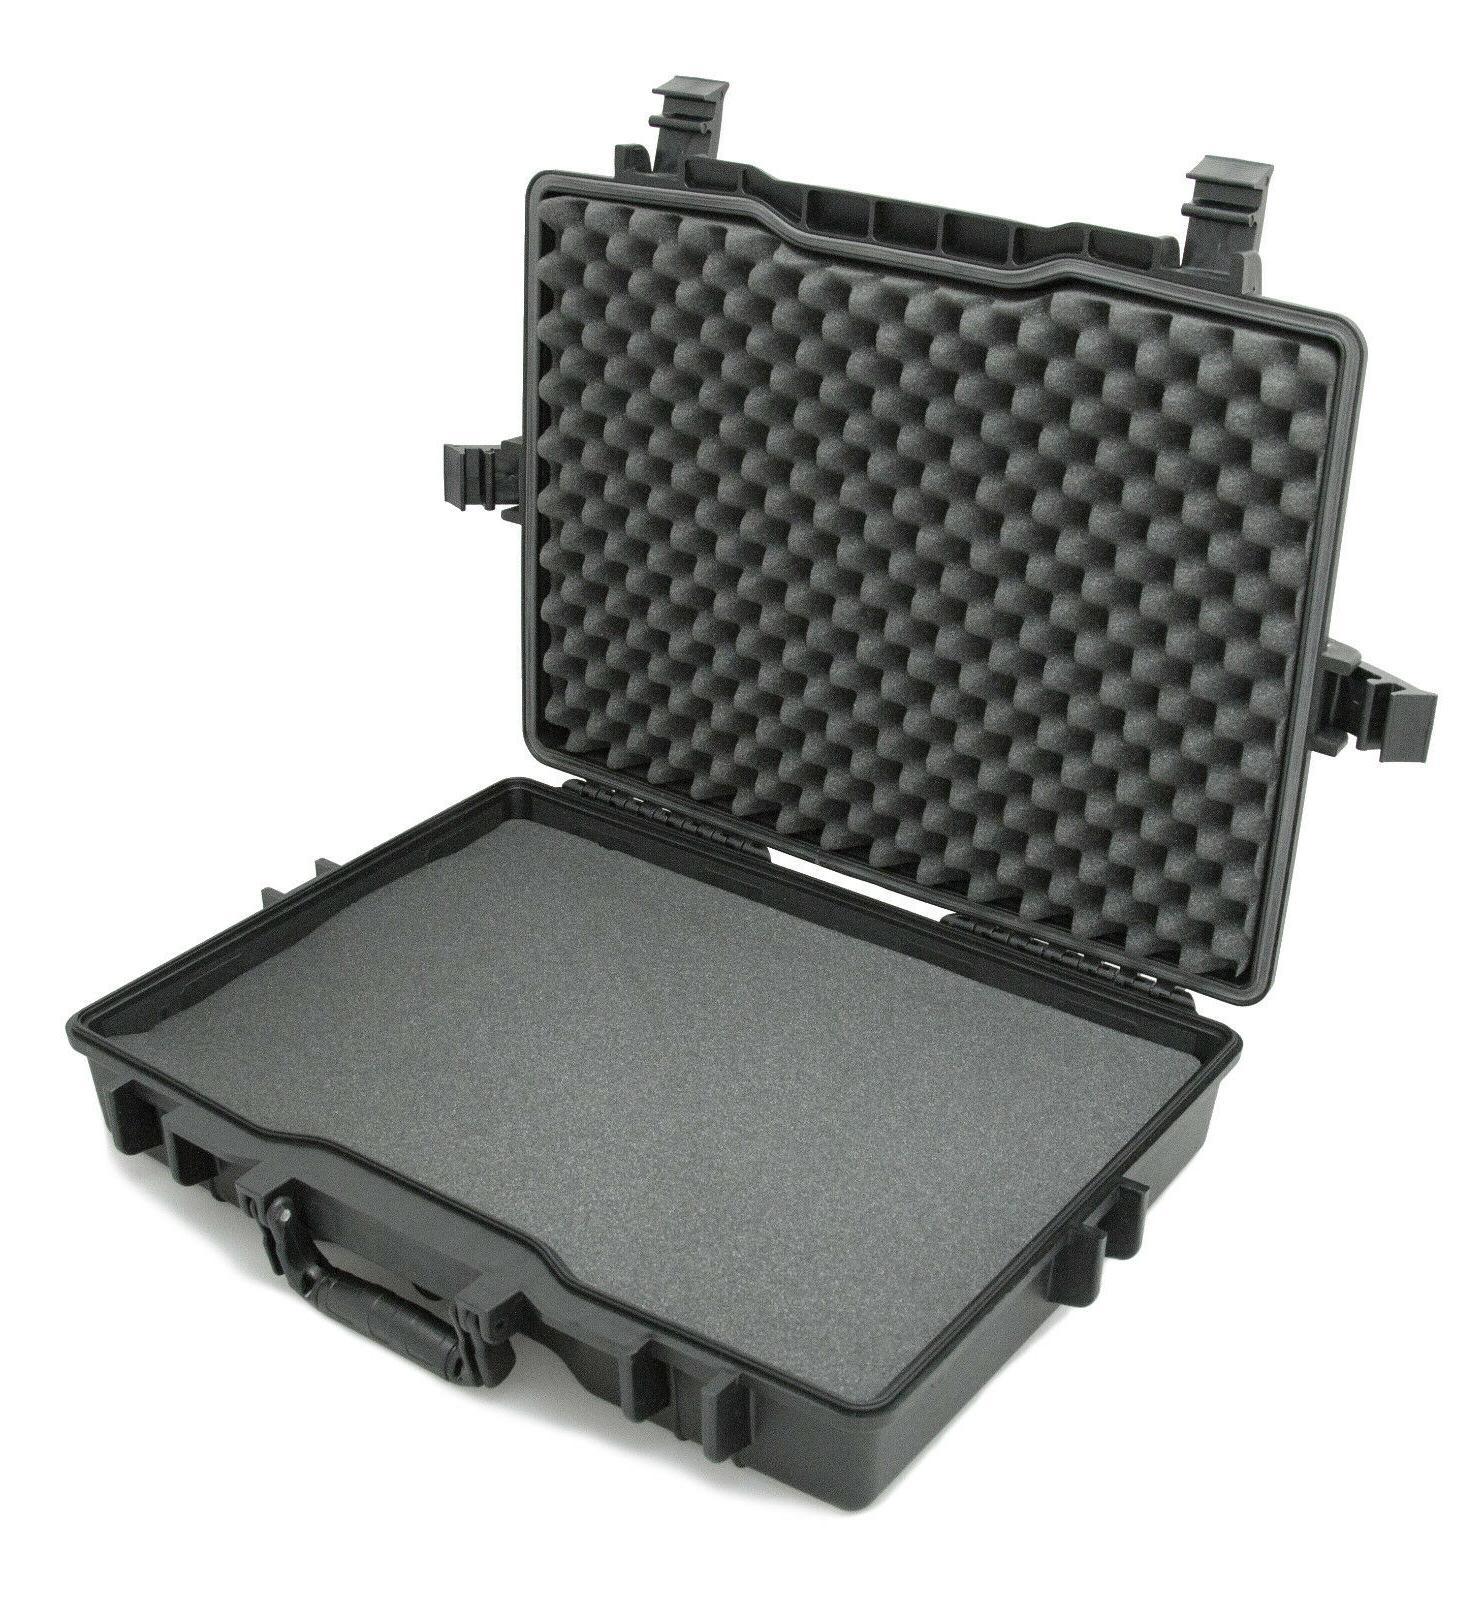 Waterproof Monitor Case Fits 17-inch